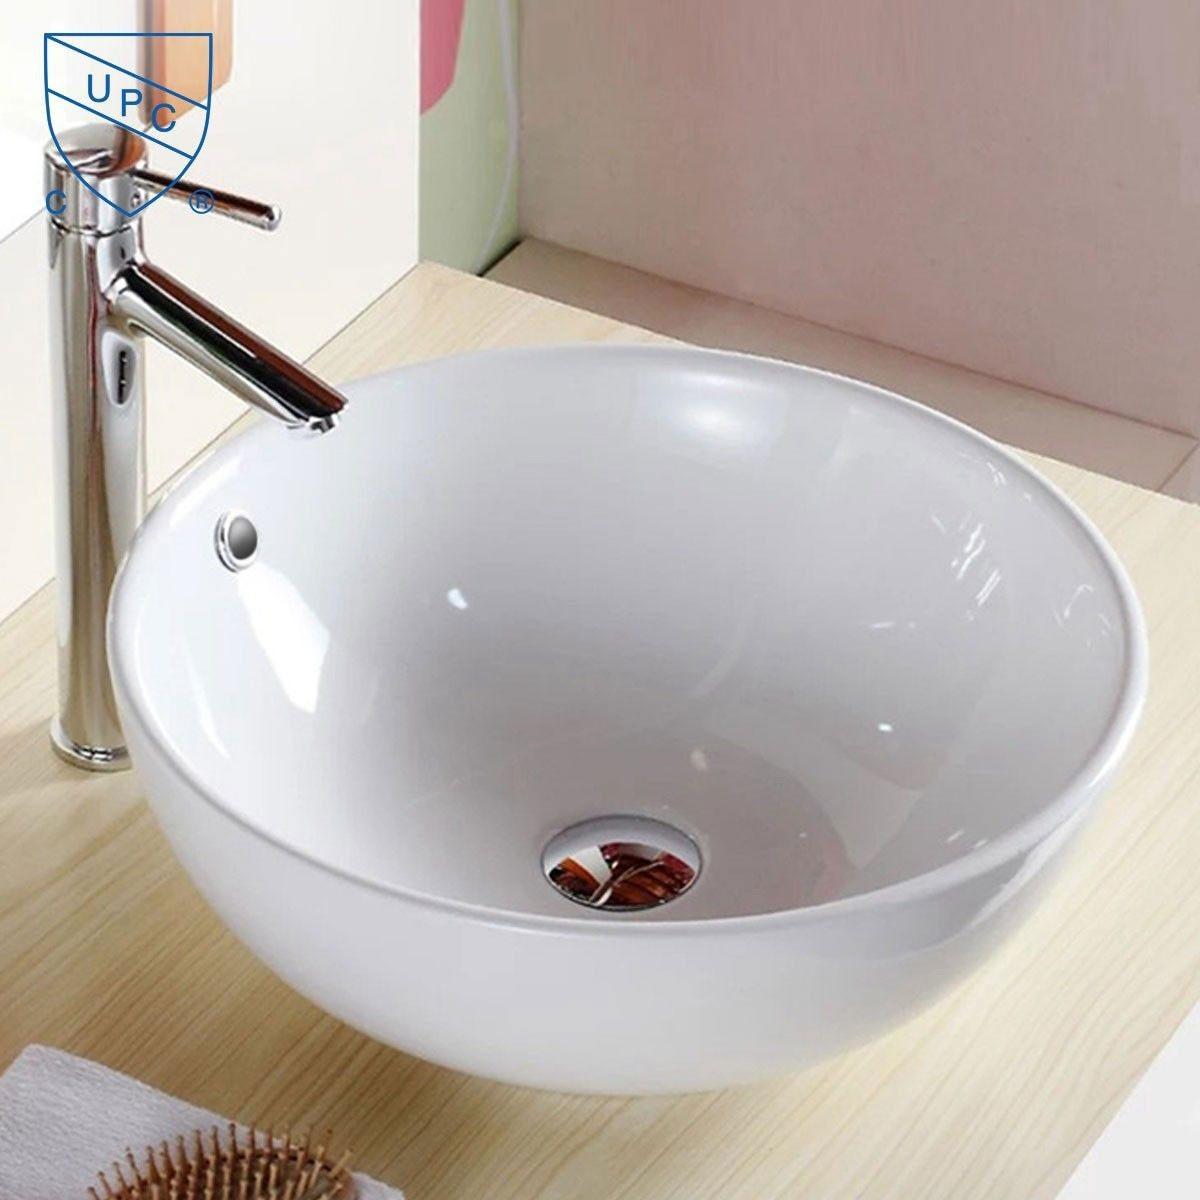 Lavabo vasque rond de dessus de comptoir en c ramique for Dessus de comptoir de salle de bain